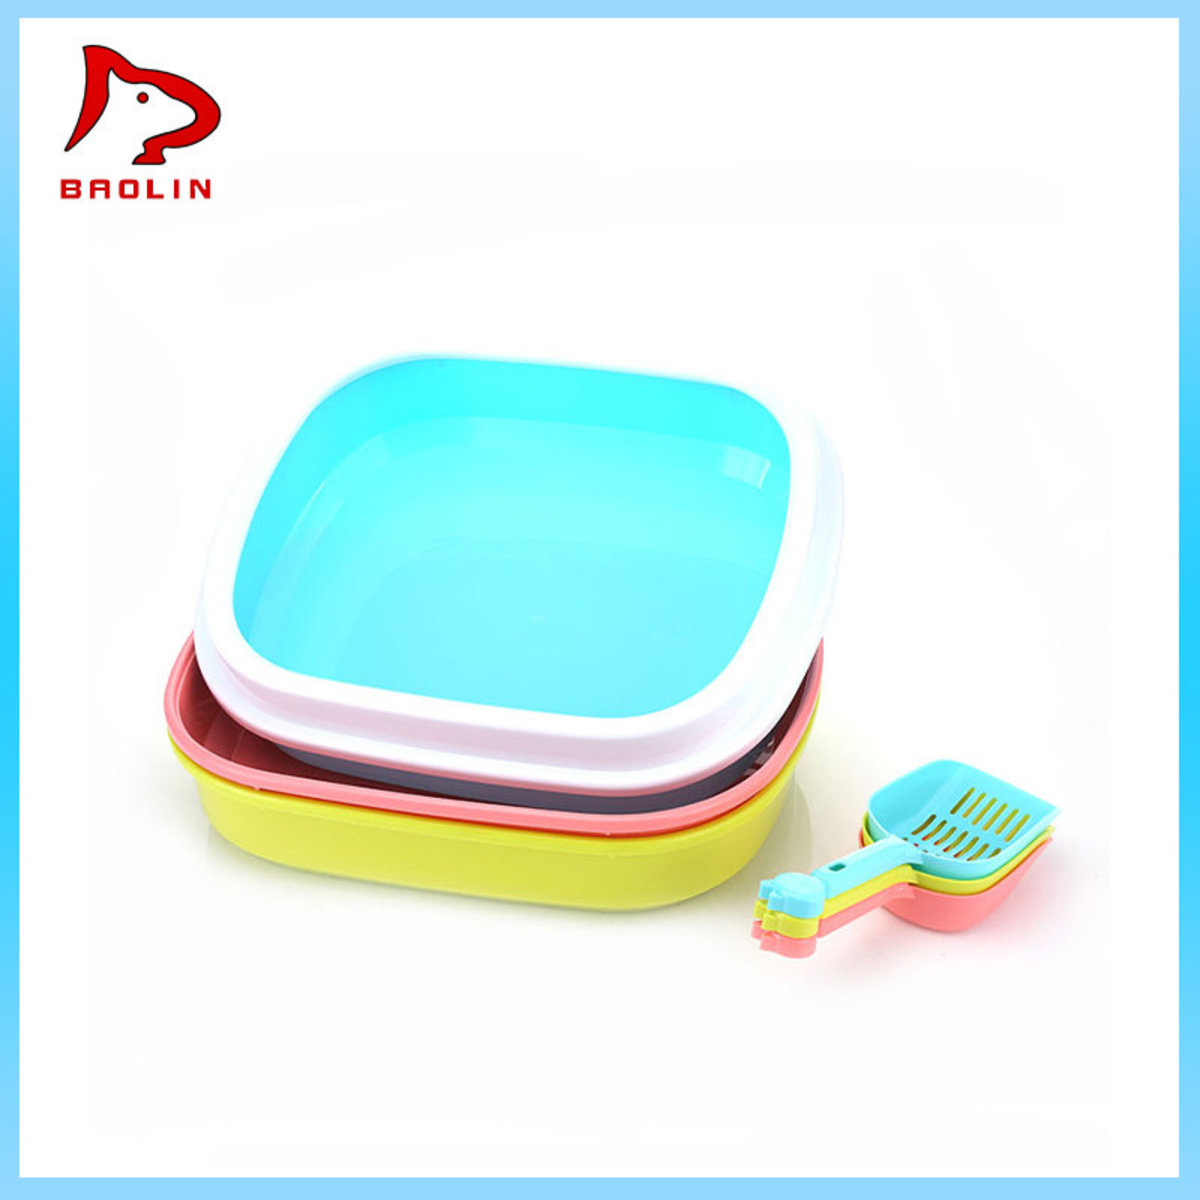 Umika Litter Box With Shovel - Medium